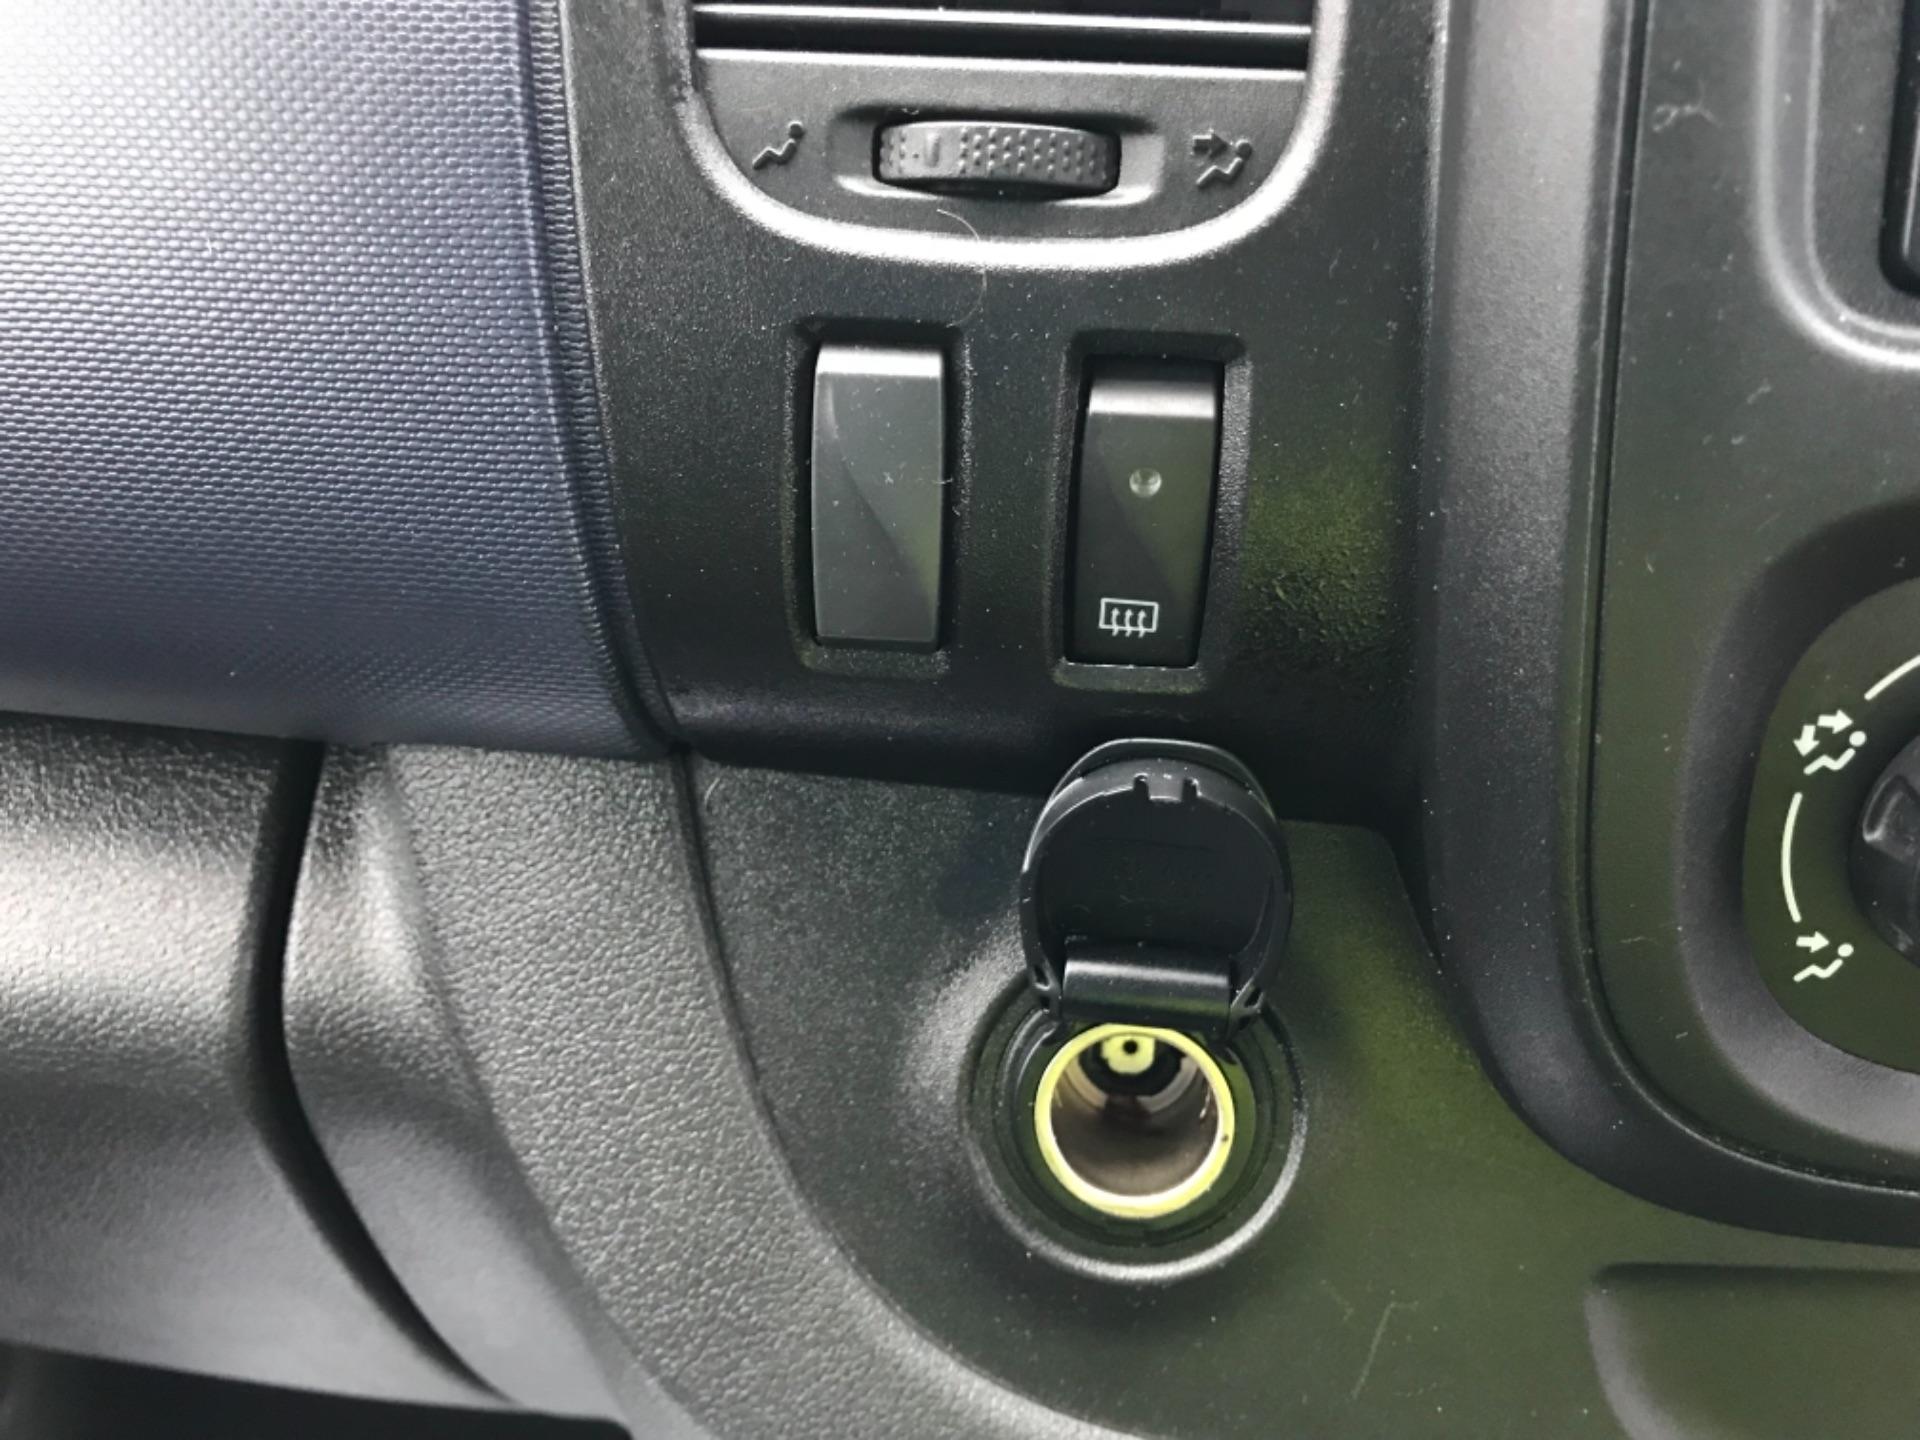 2017 Vauxhall Vivaro 2900 1.6Cdti Biturbo 125Ps H1 Combi 9 Seat Euro 6 (DY17UGF) Image 15